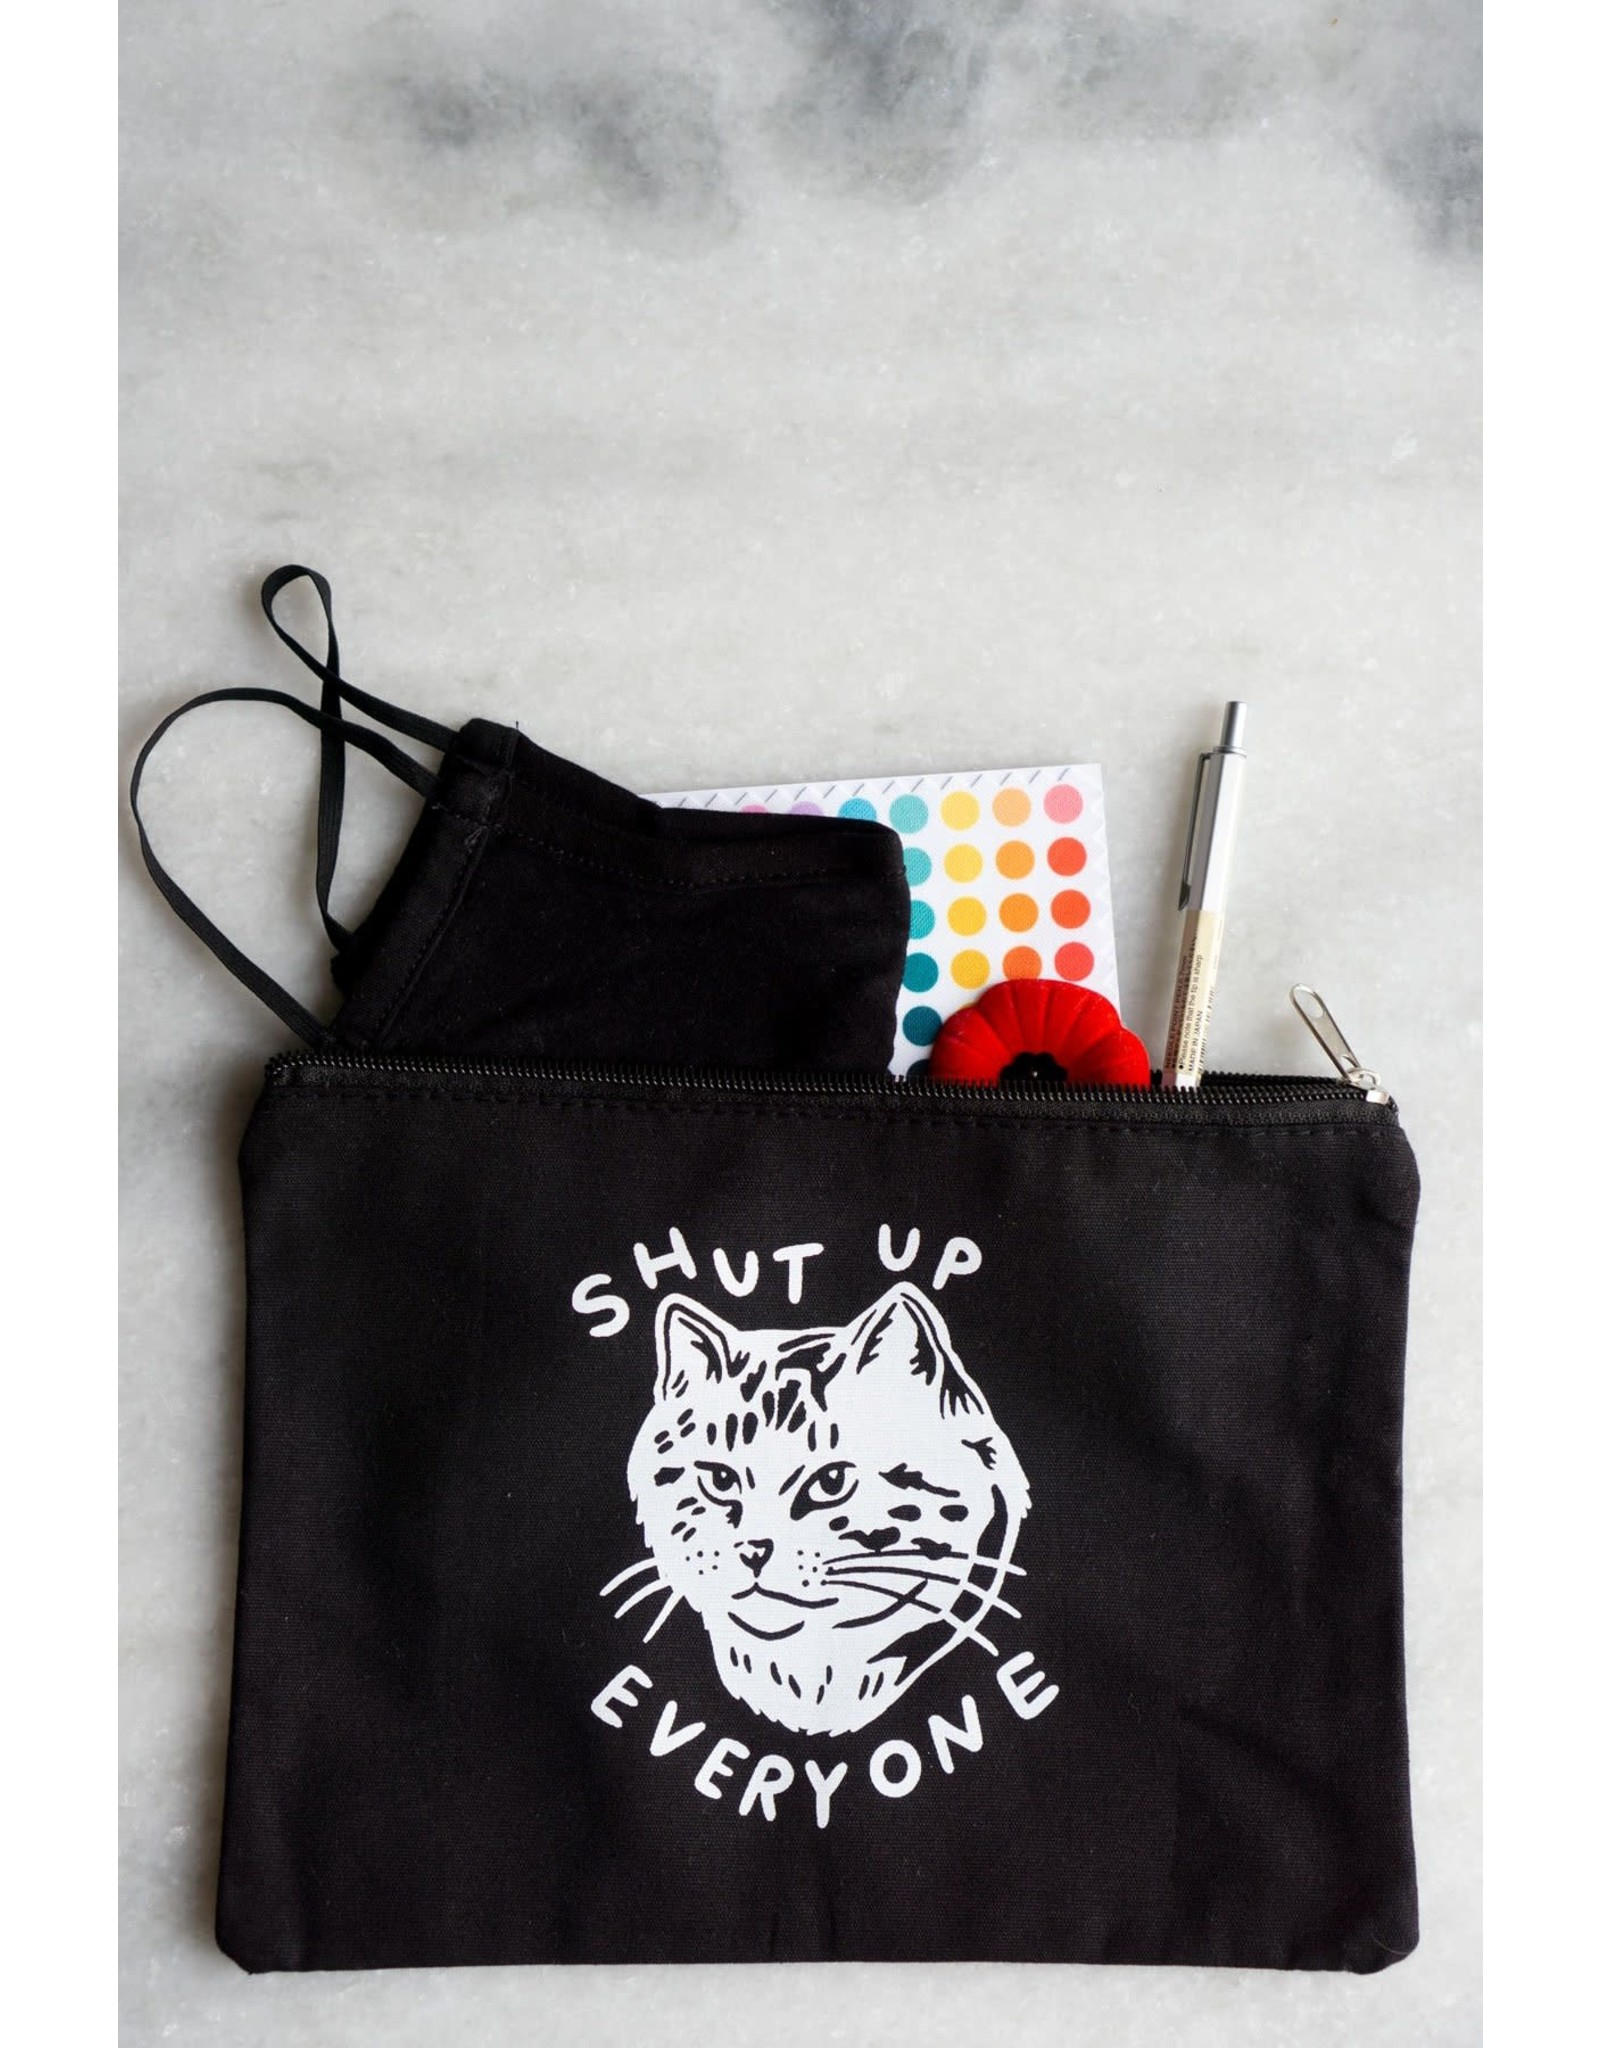 Stay Home Club - Zipper Pouch/Shut Up Everyone Black